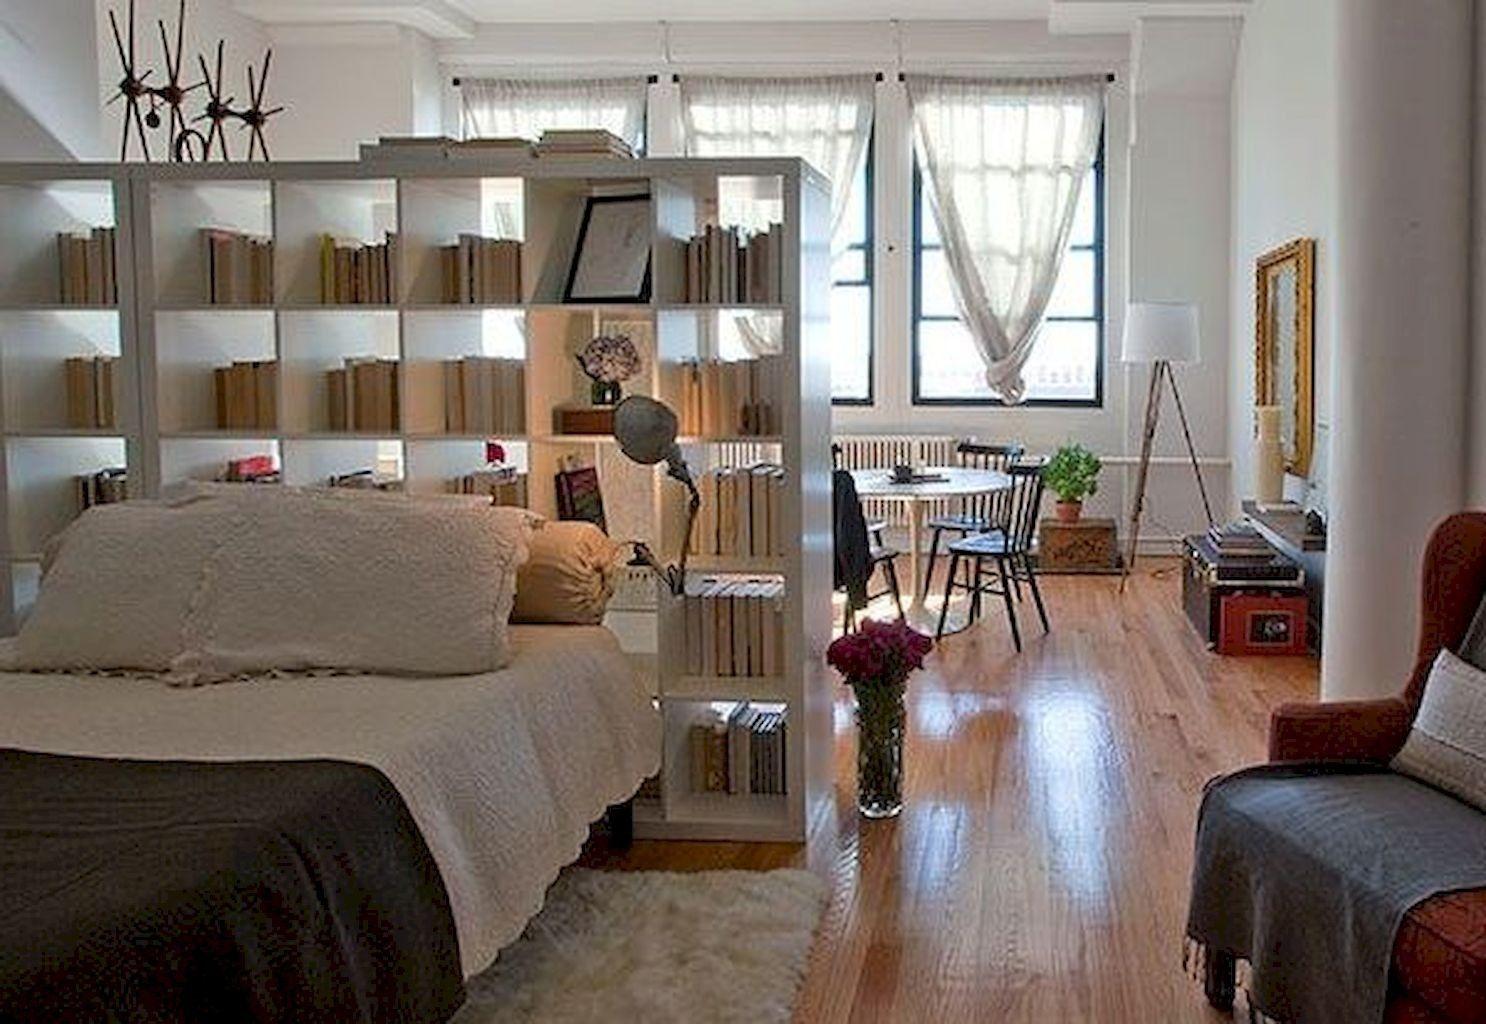 83 Best Rental Apartment Studio Decor Ideas Apartment Apartmentdecor Apa Apartment Decorating On A Budget Small Apartment Decorating Small Apartment Layout